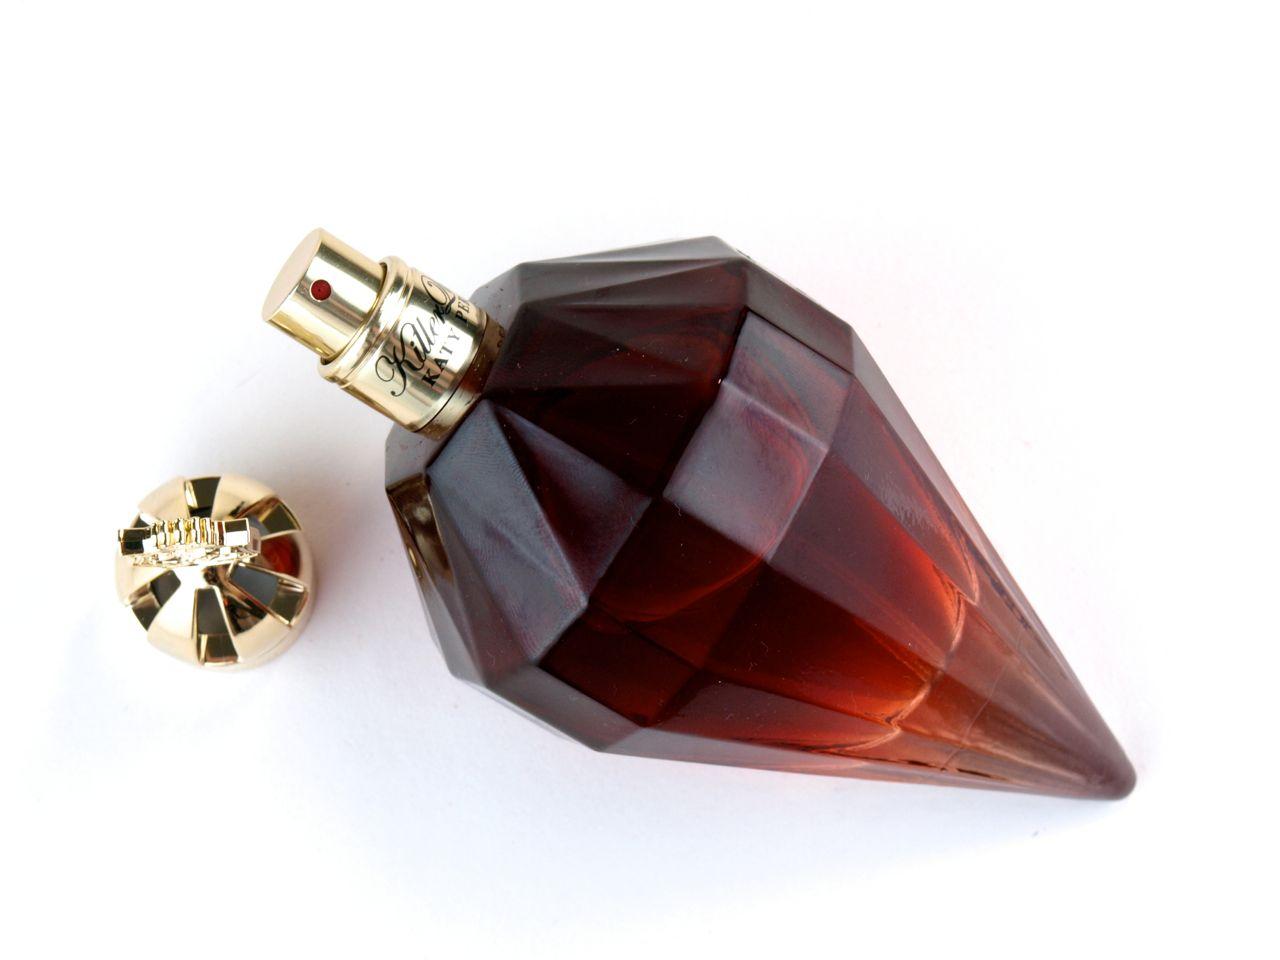 Killer Queen Katy Perry Eau de Parfum: Review